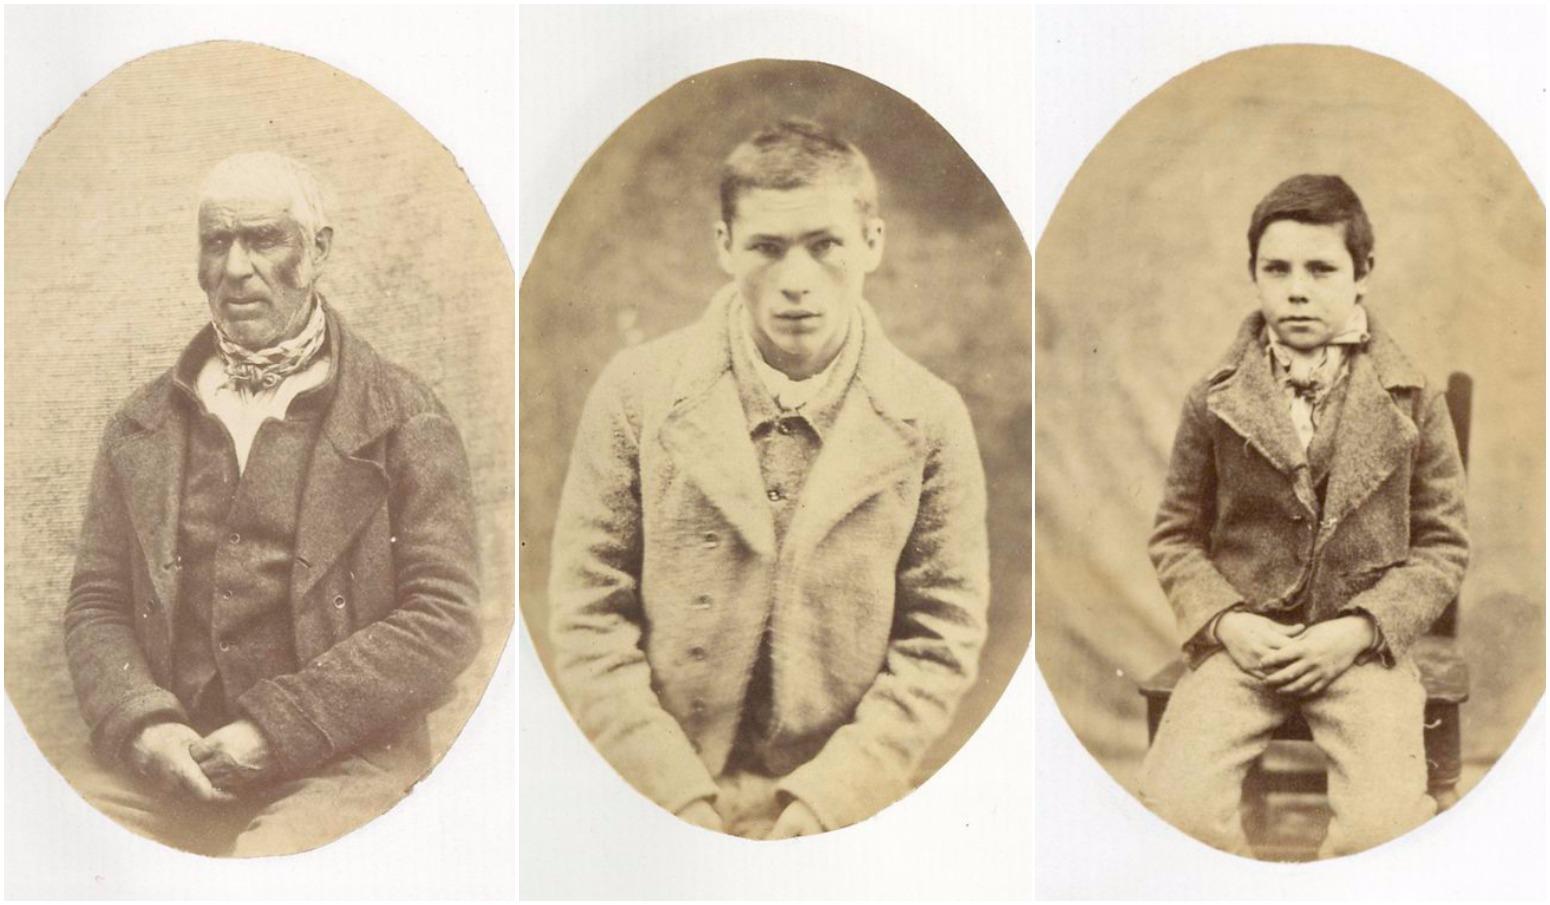 Irish prison mugshots from over 150 years ago provide haunting